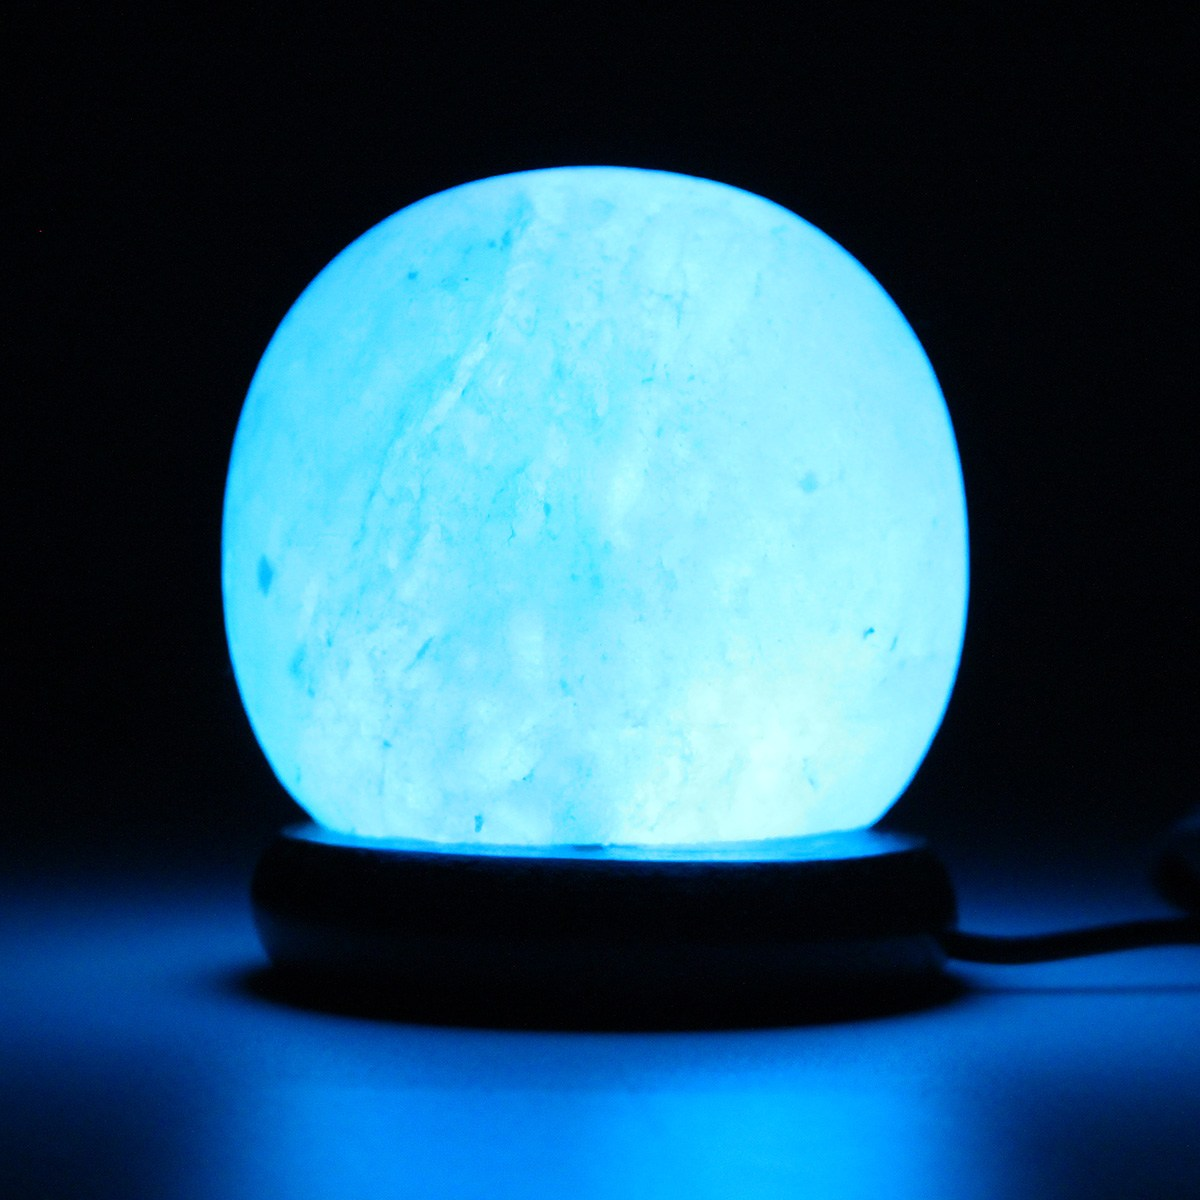 Luzes da Noite sal de cristal luz colorida Material do Corpo : Cristal